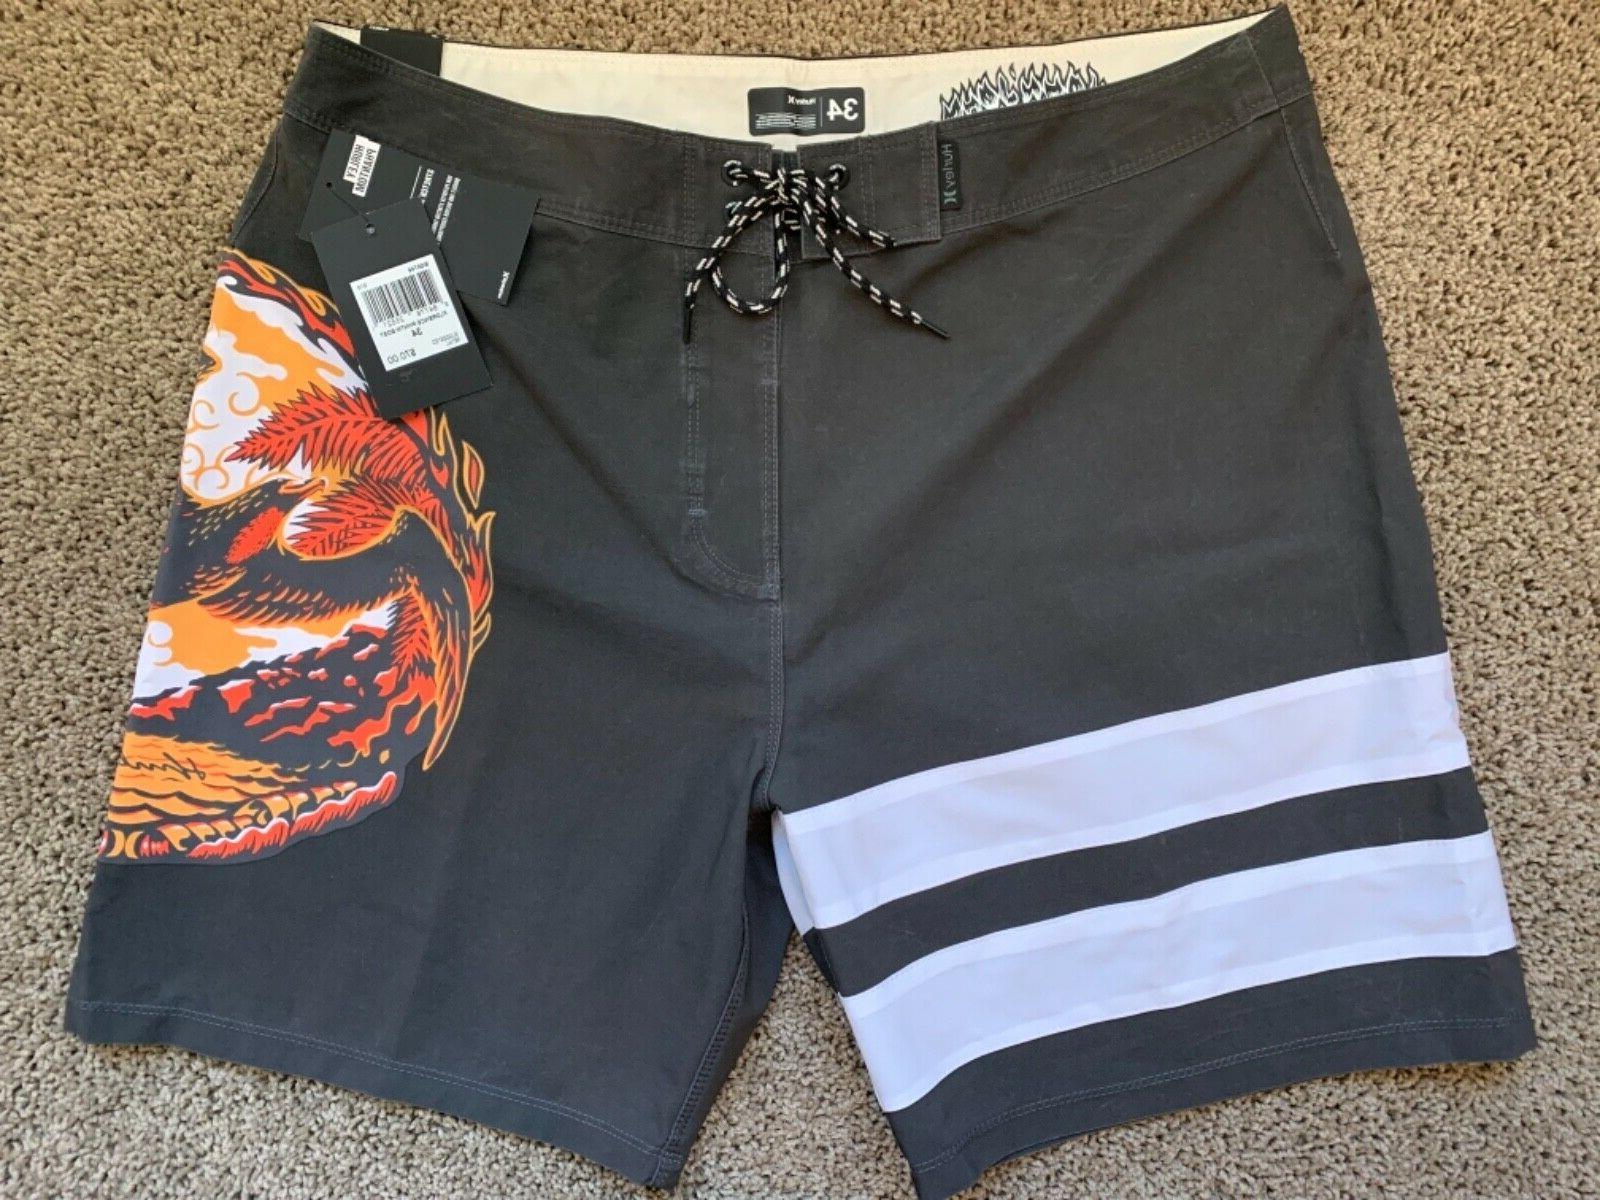 70 brand new phantom mens board shorts